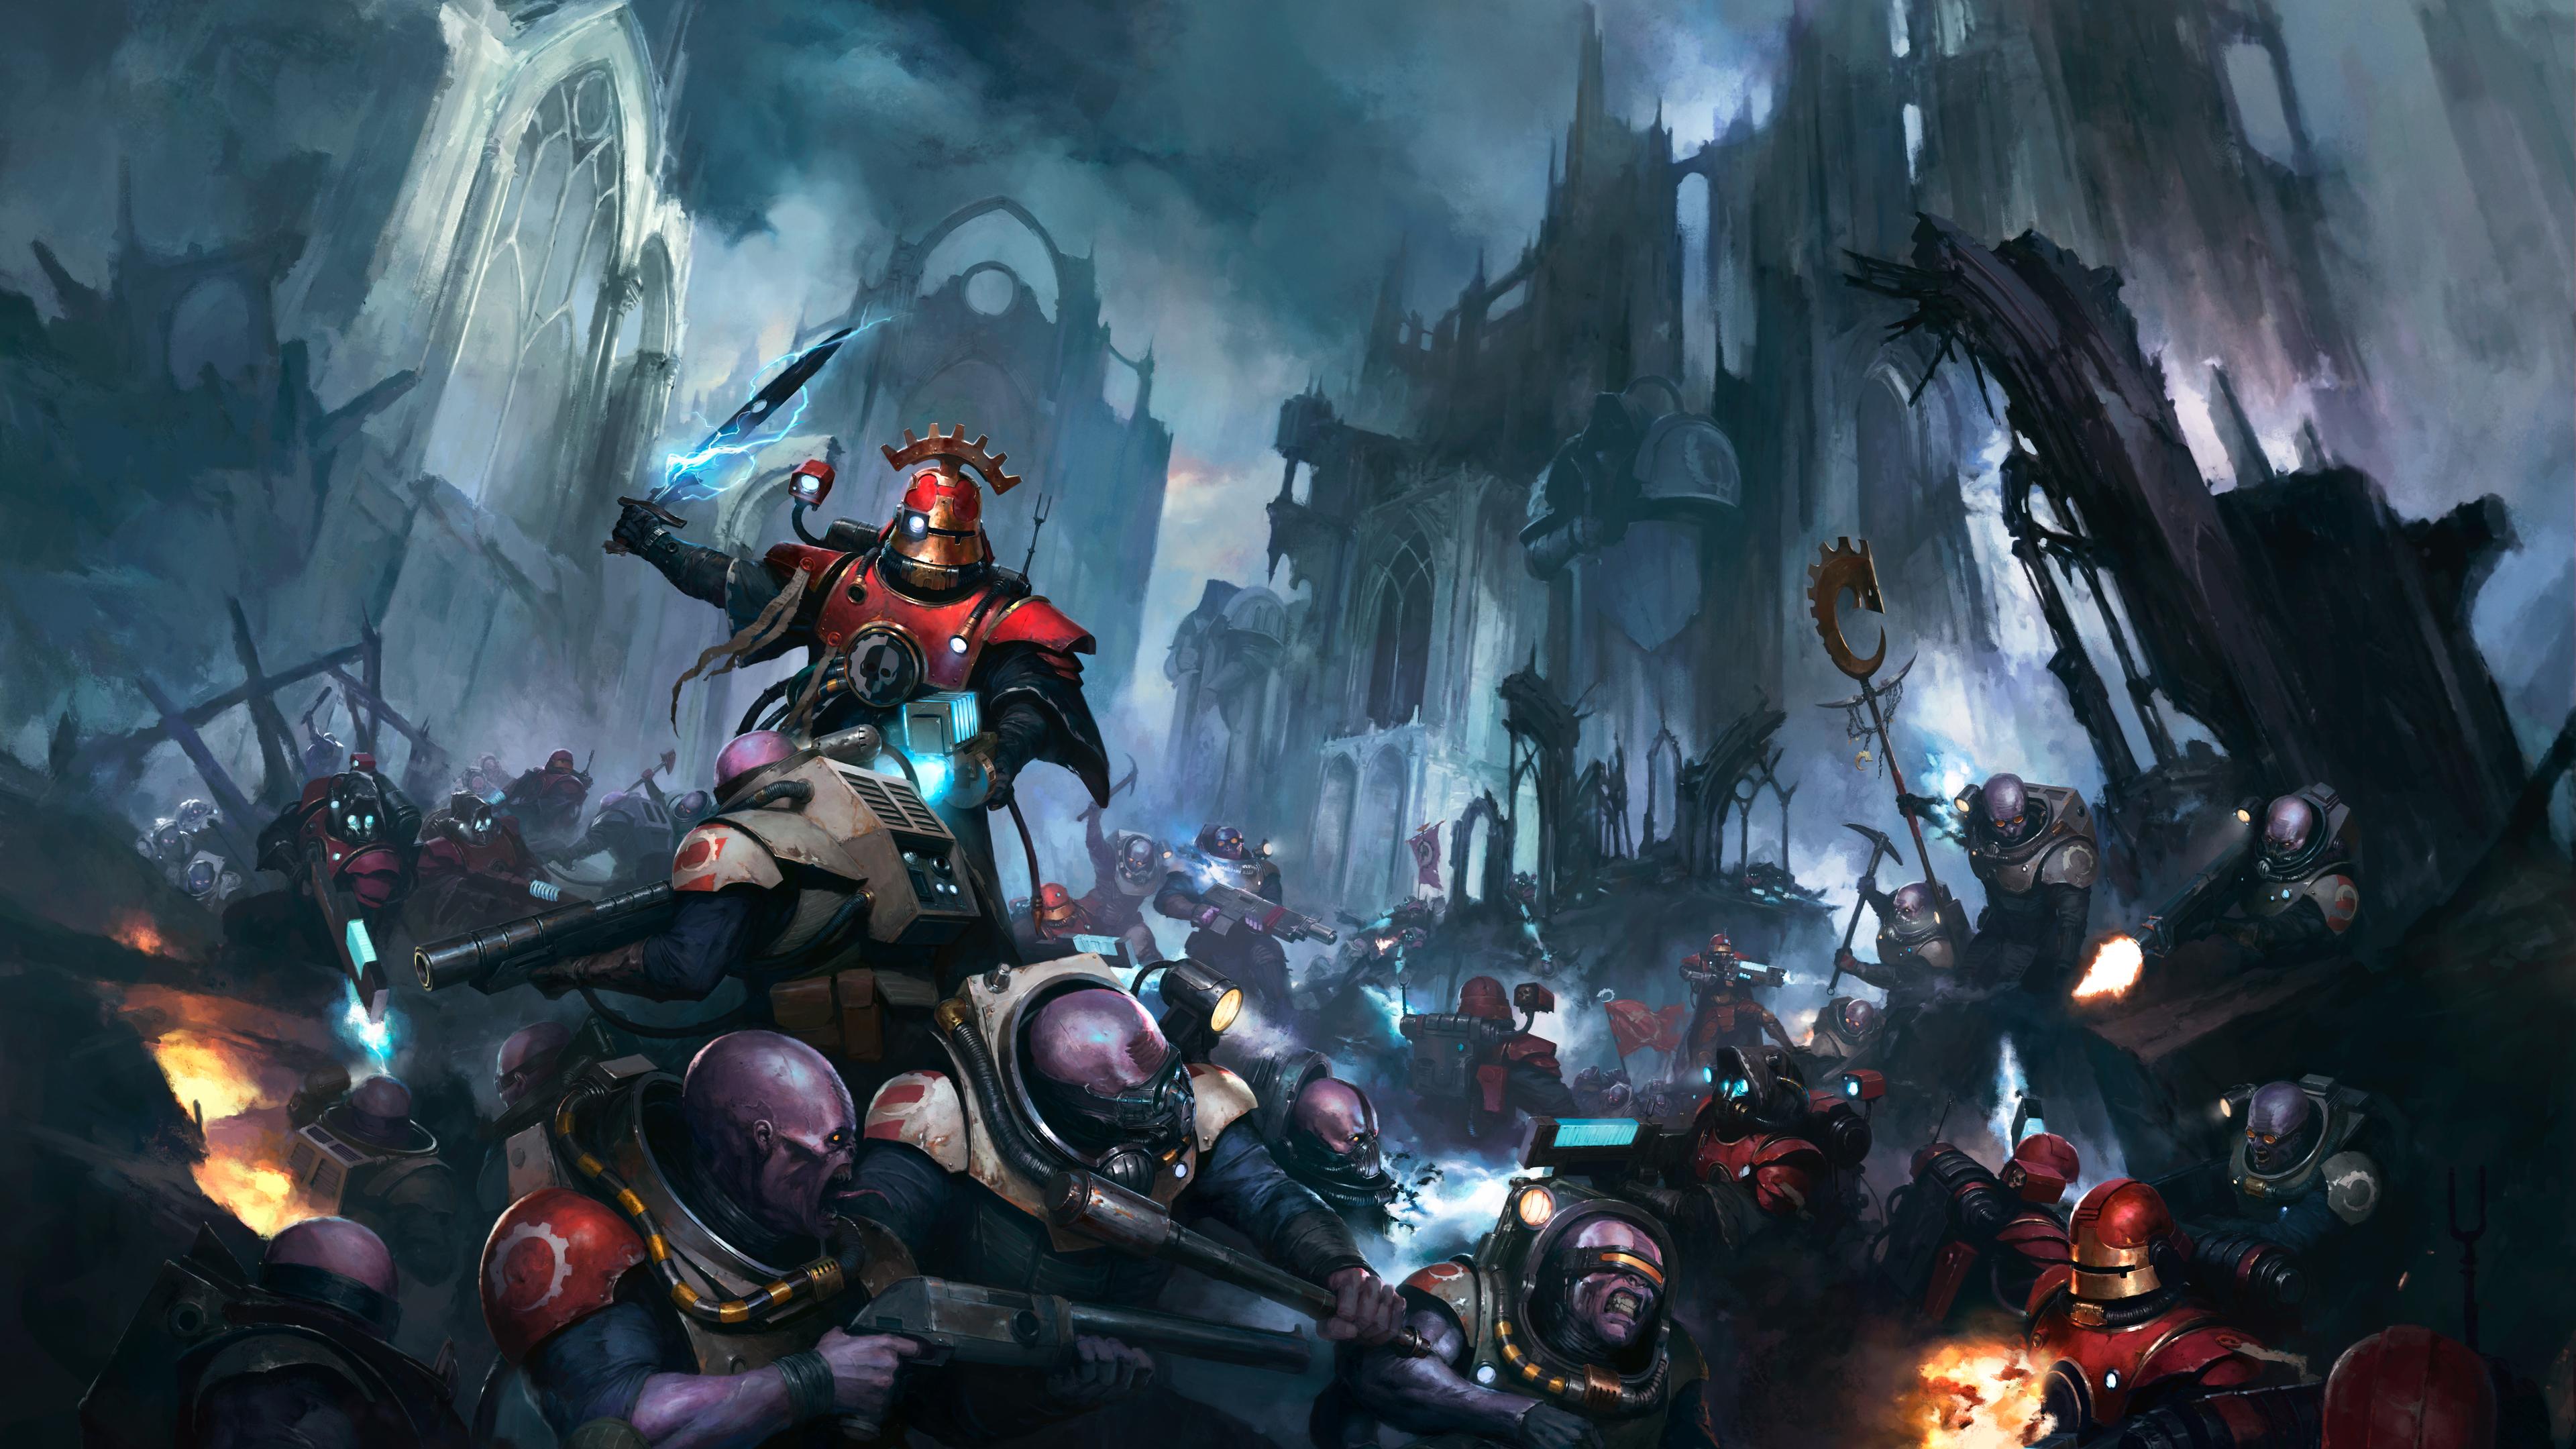 warhammer 40000 1570393477 - Warhammer 40000 - warhammer 40000 dawn of war iii wallpapers, pc games wallpapers, hd-wallpapers, games wallpapers, 8k wallpapers, 5k wallpapers, 4k-wallpapers